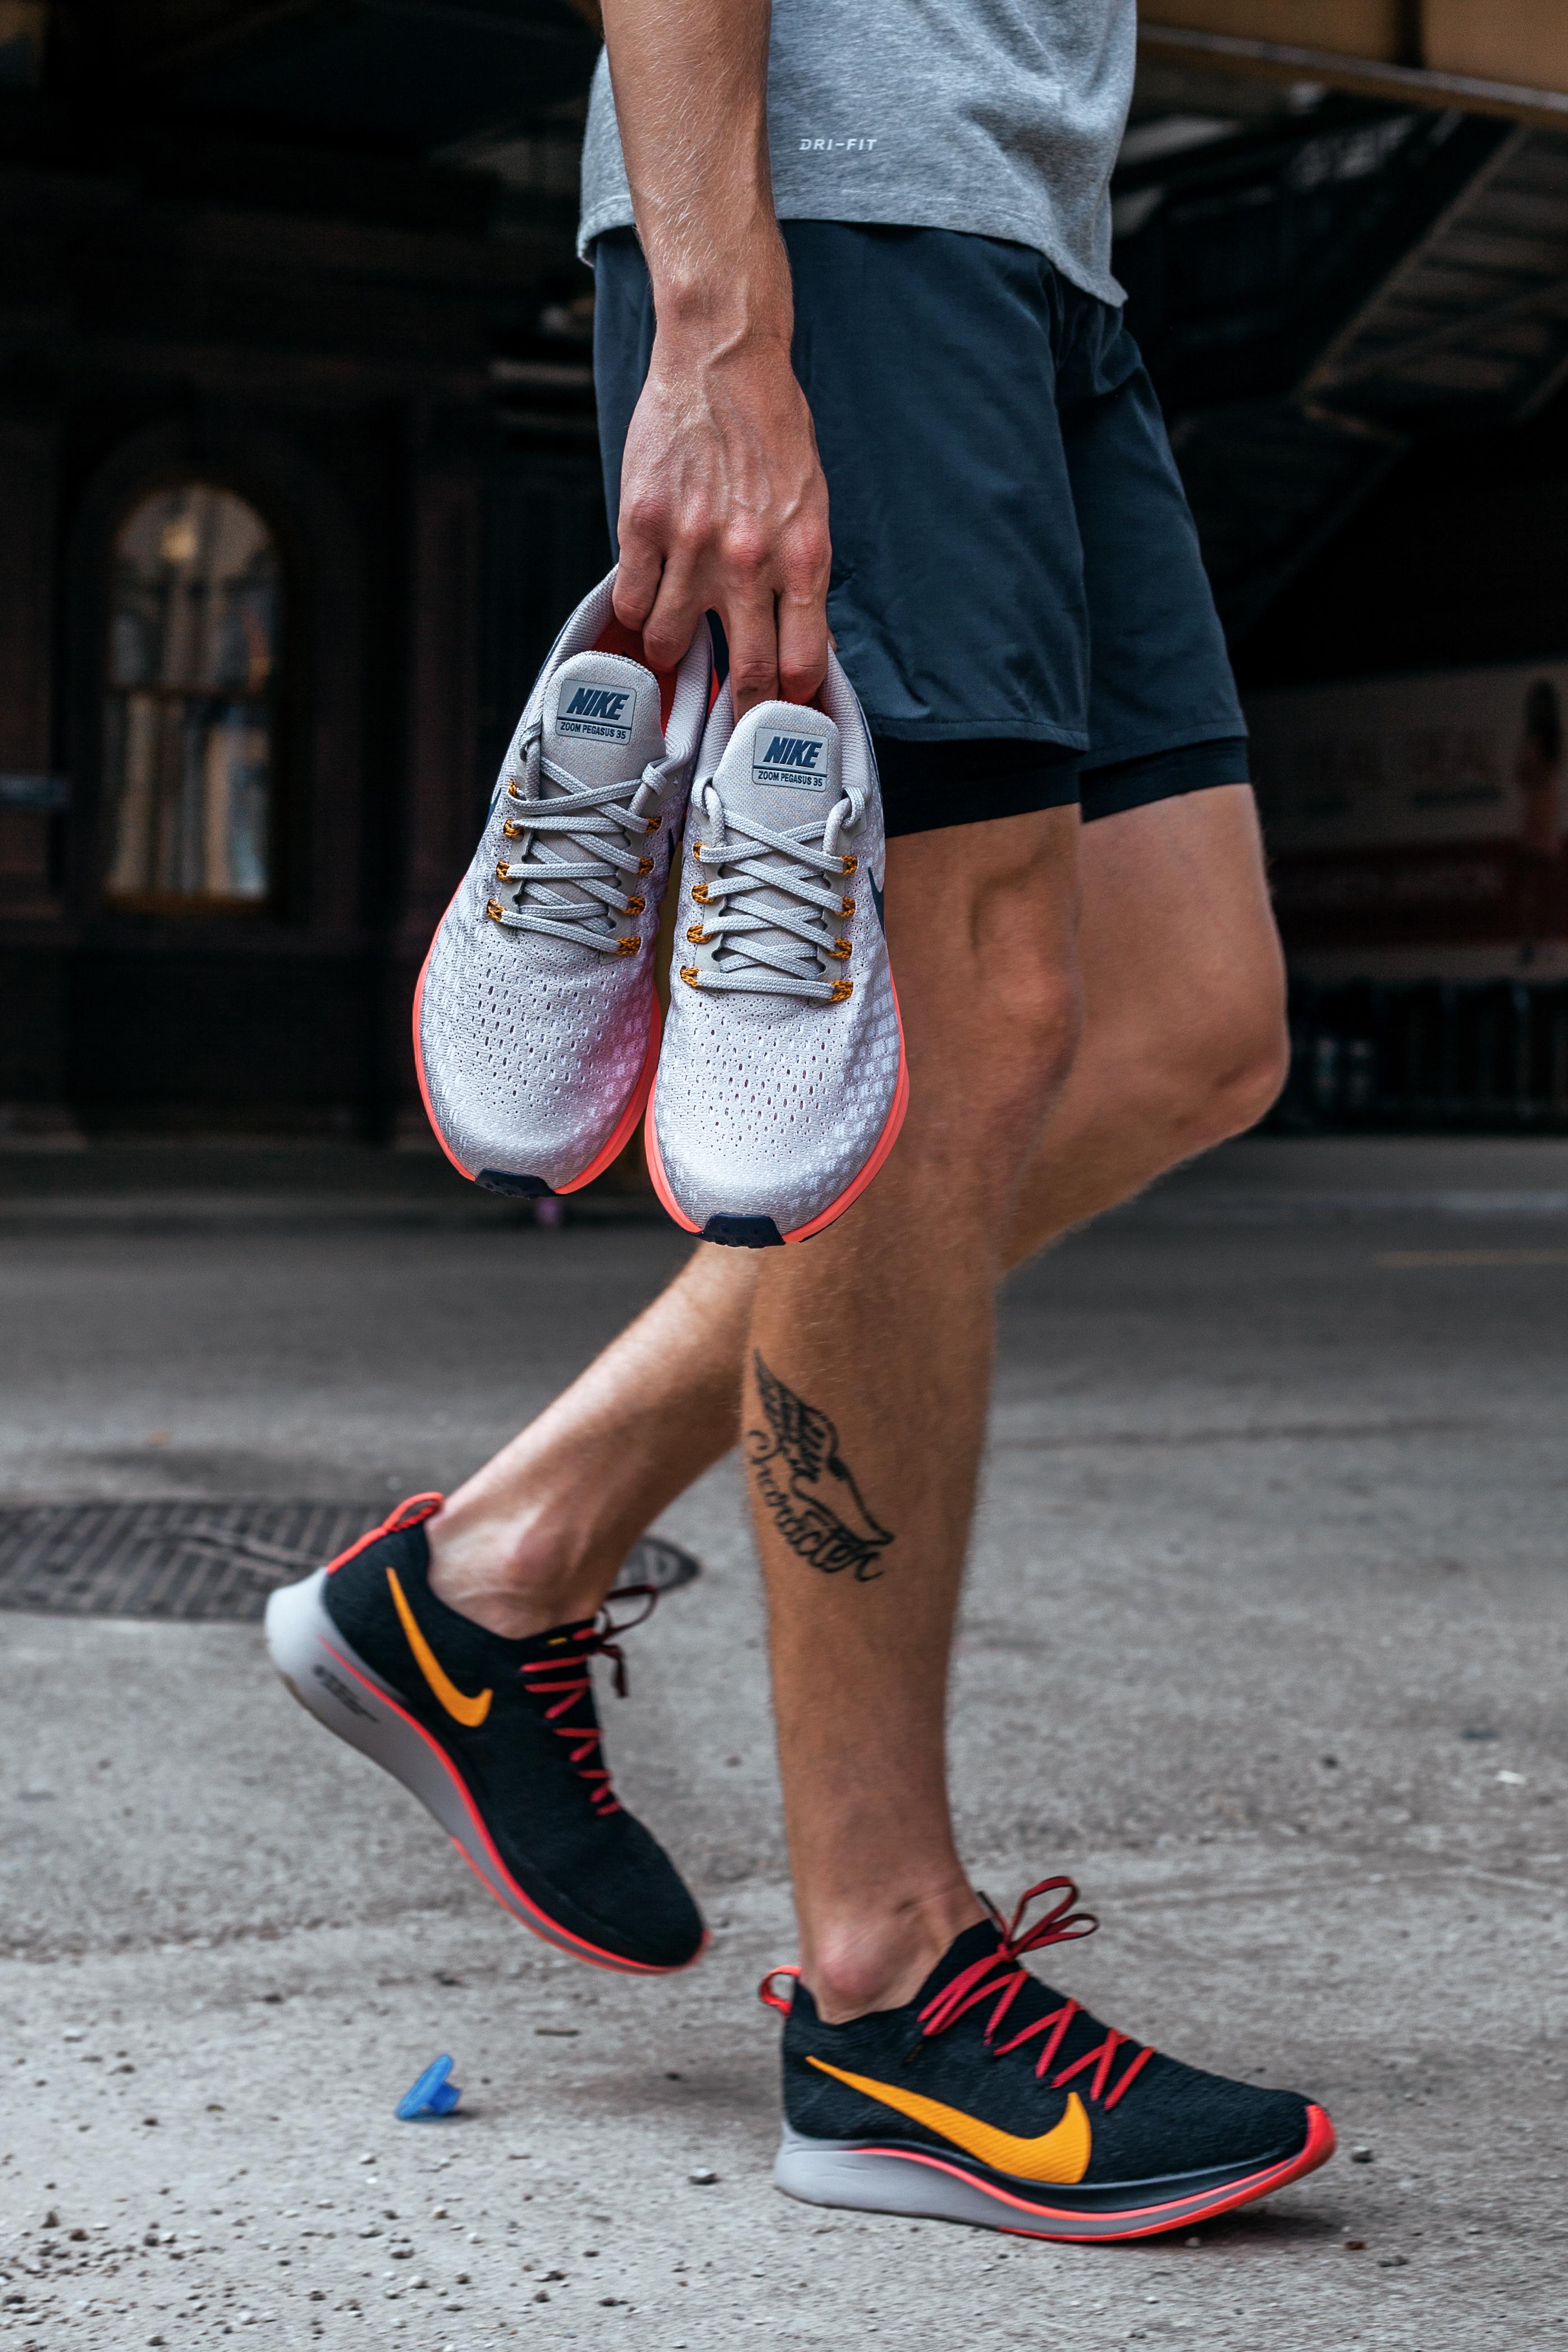 brand new 1535b 6e64a The Nike 'Squad Run' Pack